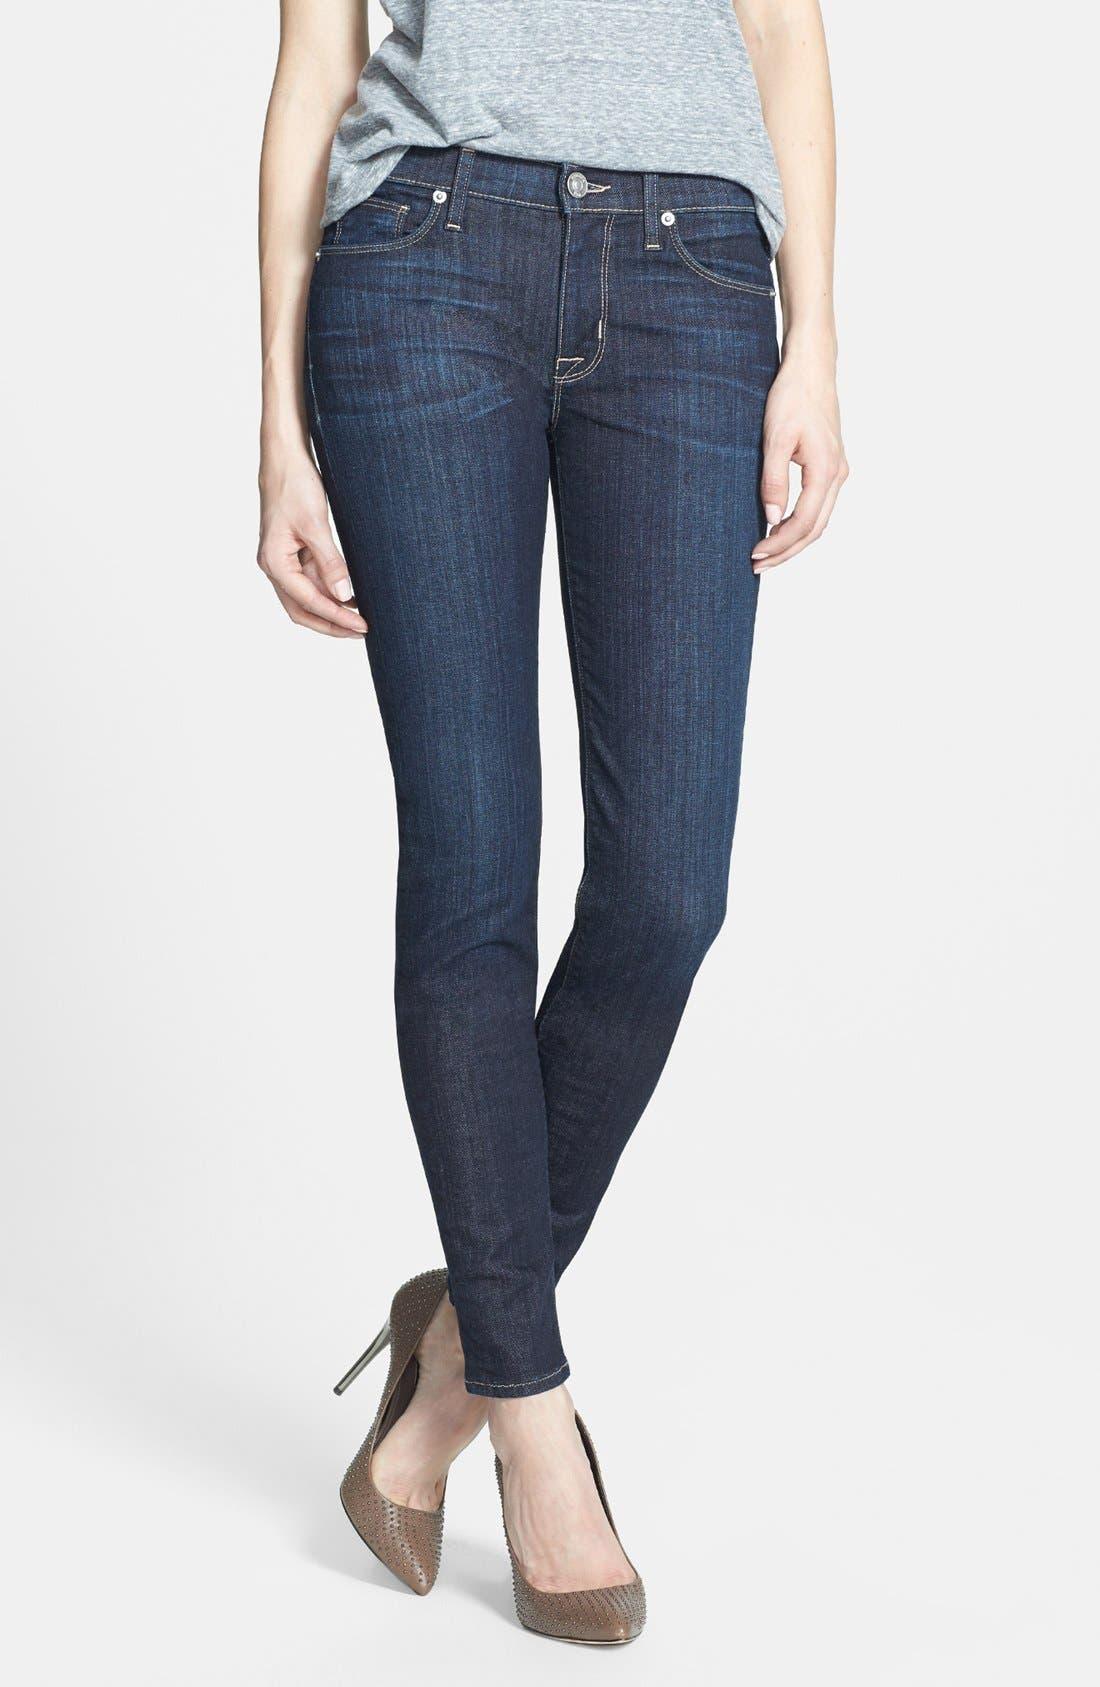 Main Image - Hudson Jeans 'Collette' Mid Rise Skinny Jeans (Skyline)